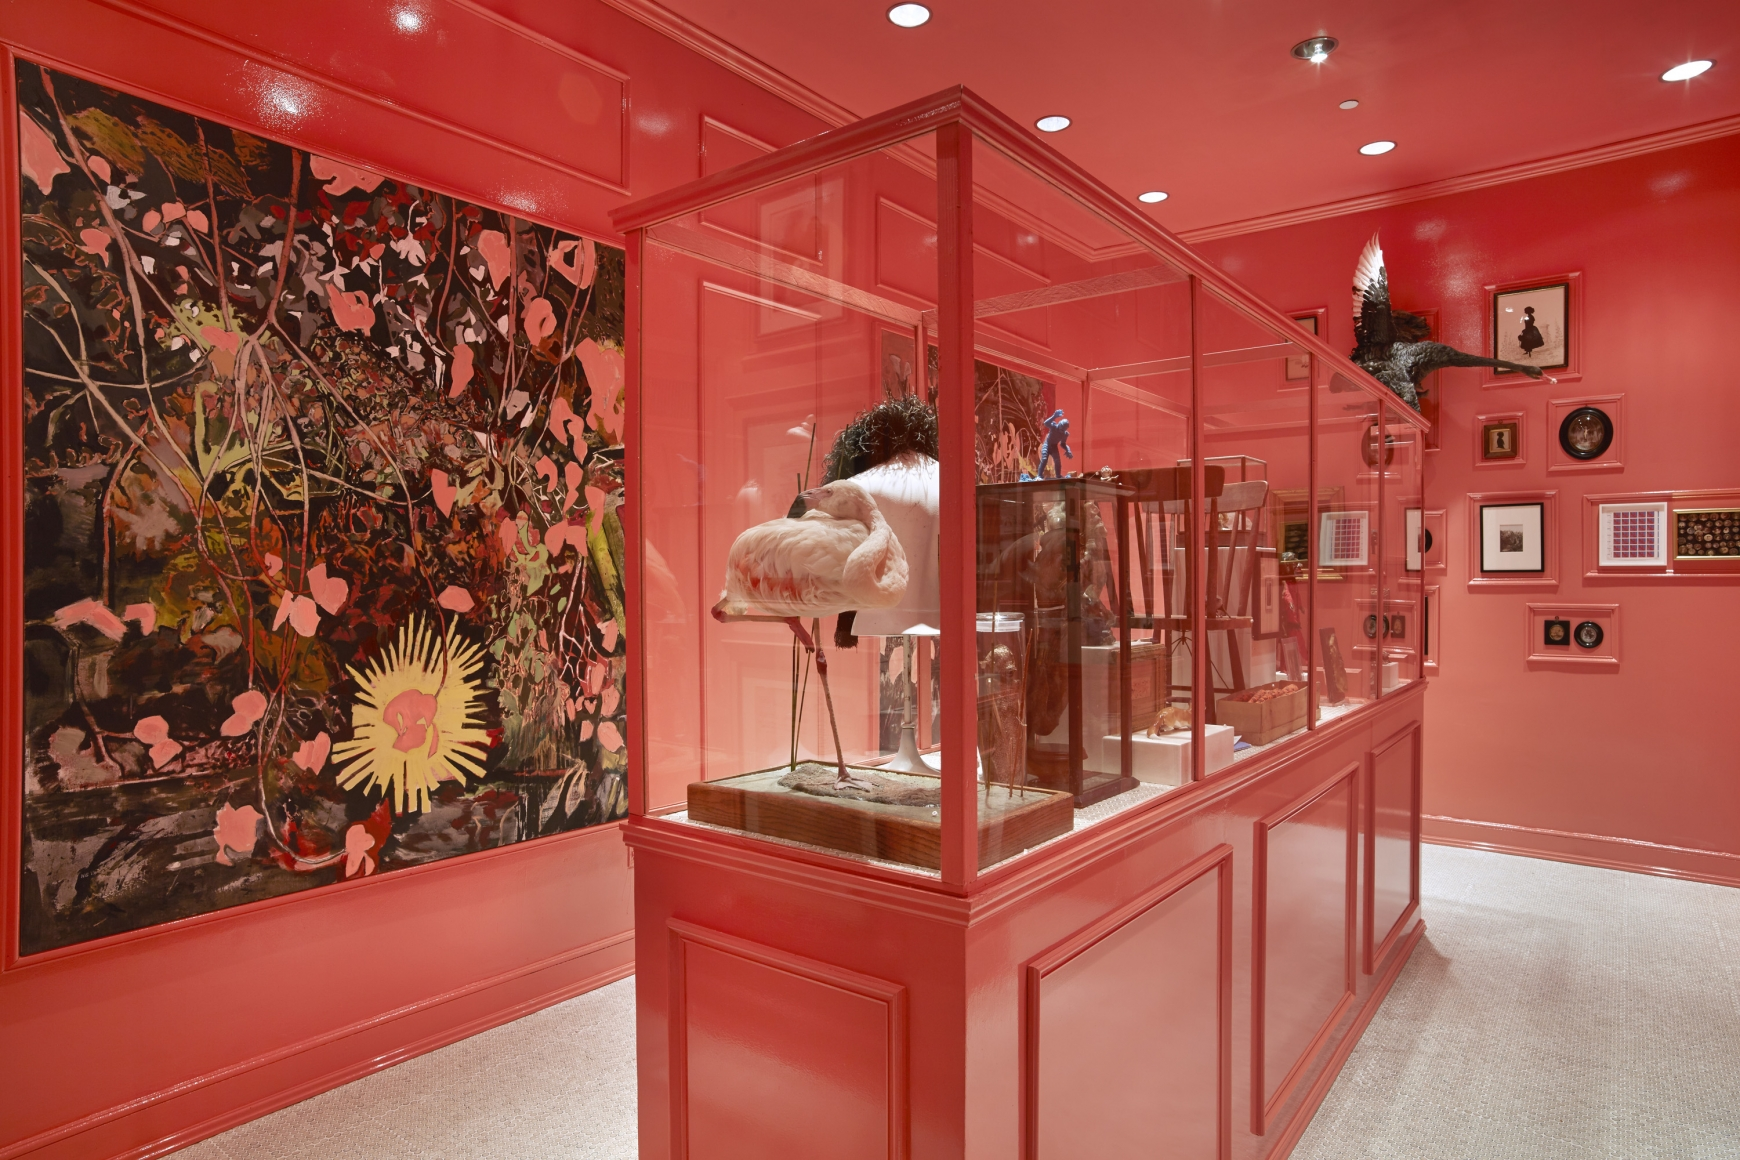 Hernan Bas,A Queer and Curious Cabinet, Bass Museumof Art, Miami, FL, 2013–2014